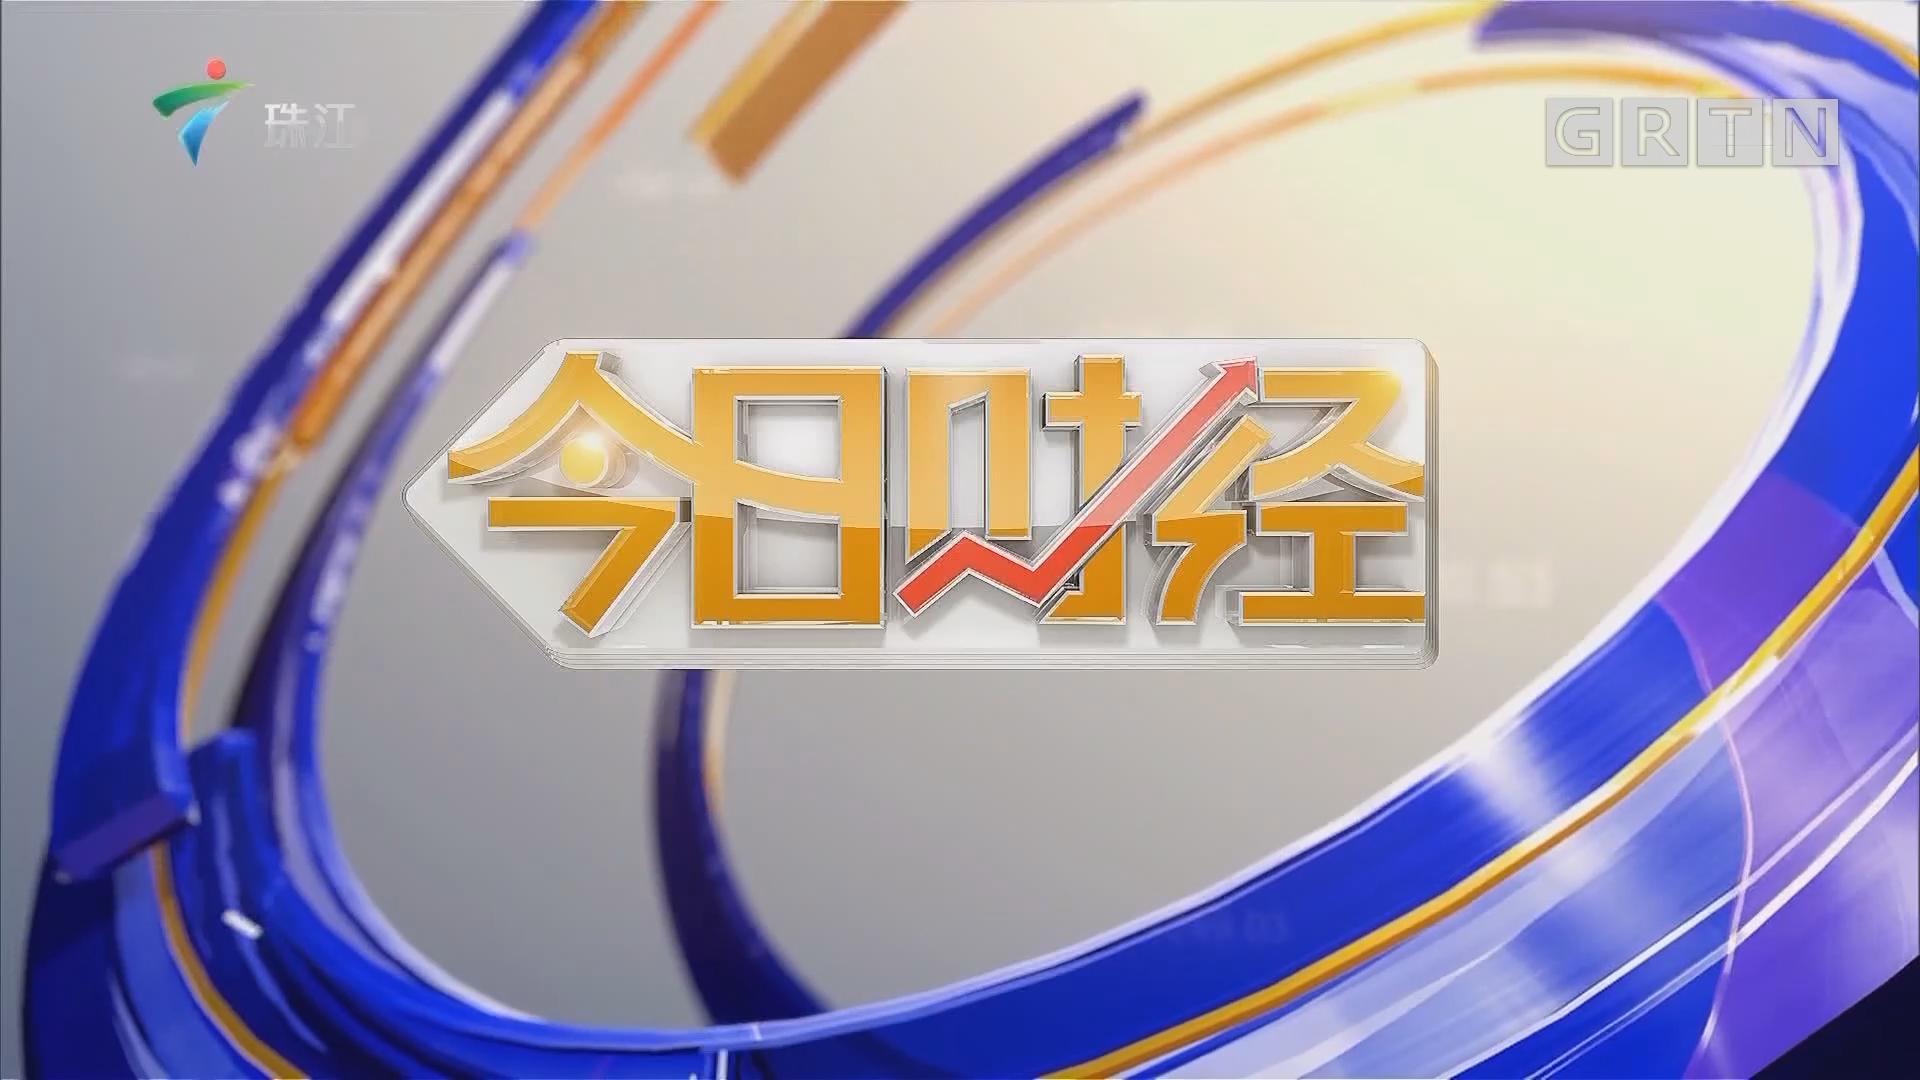 [HD][2019-04-17]今日财经:南方新媒体股份有限公司上市